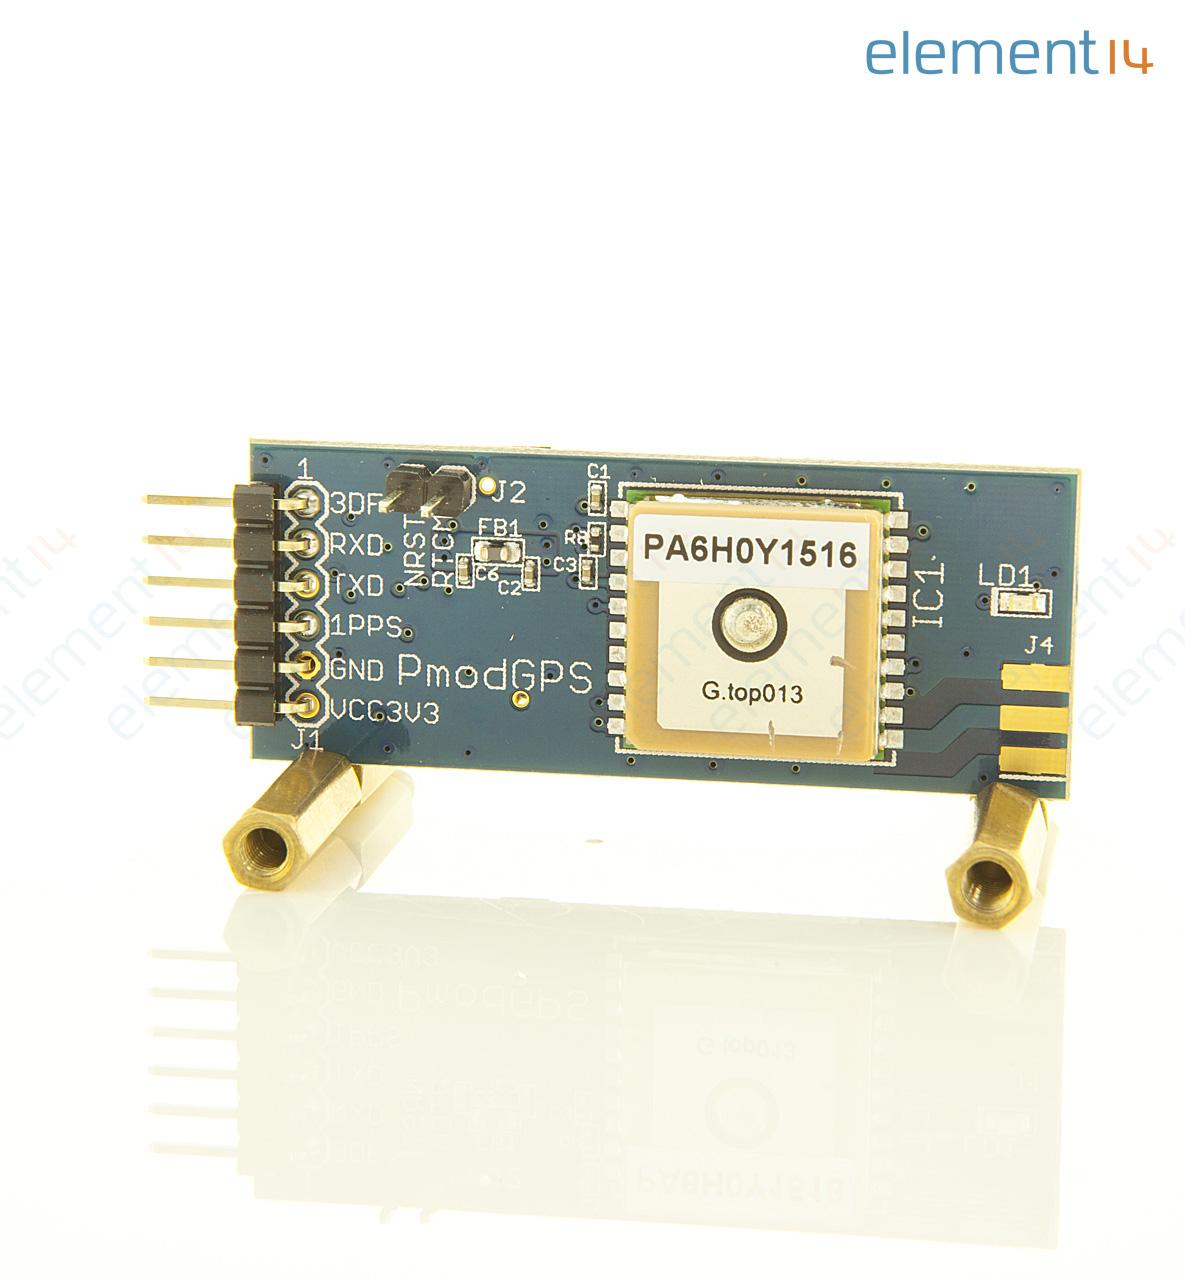 410 237 Digilent Daughter Board Pmodgps Gps Receiver Module Circuit